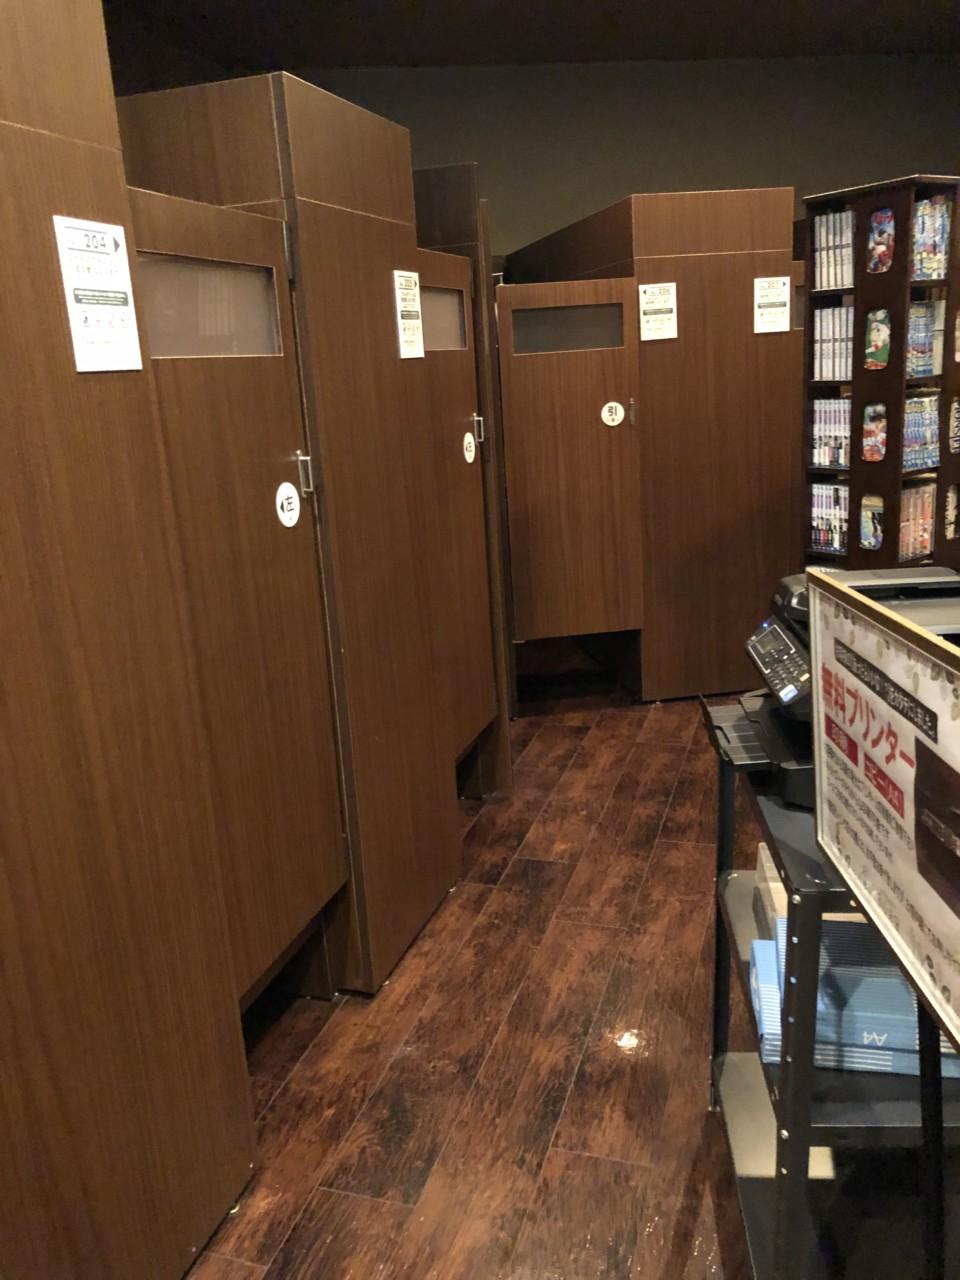 安心お宿秋葉原電気街店